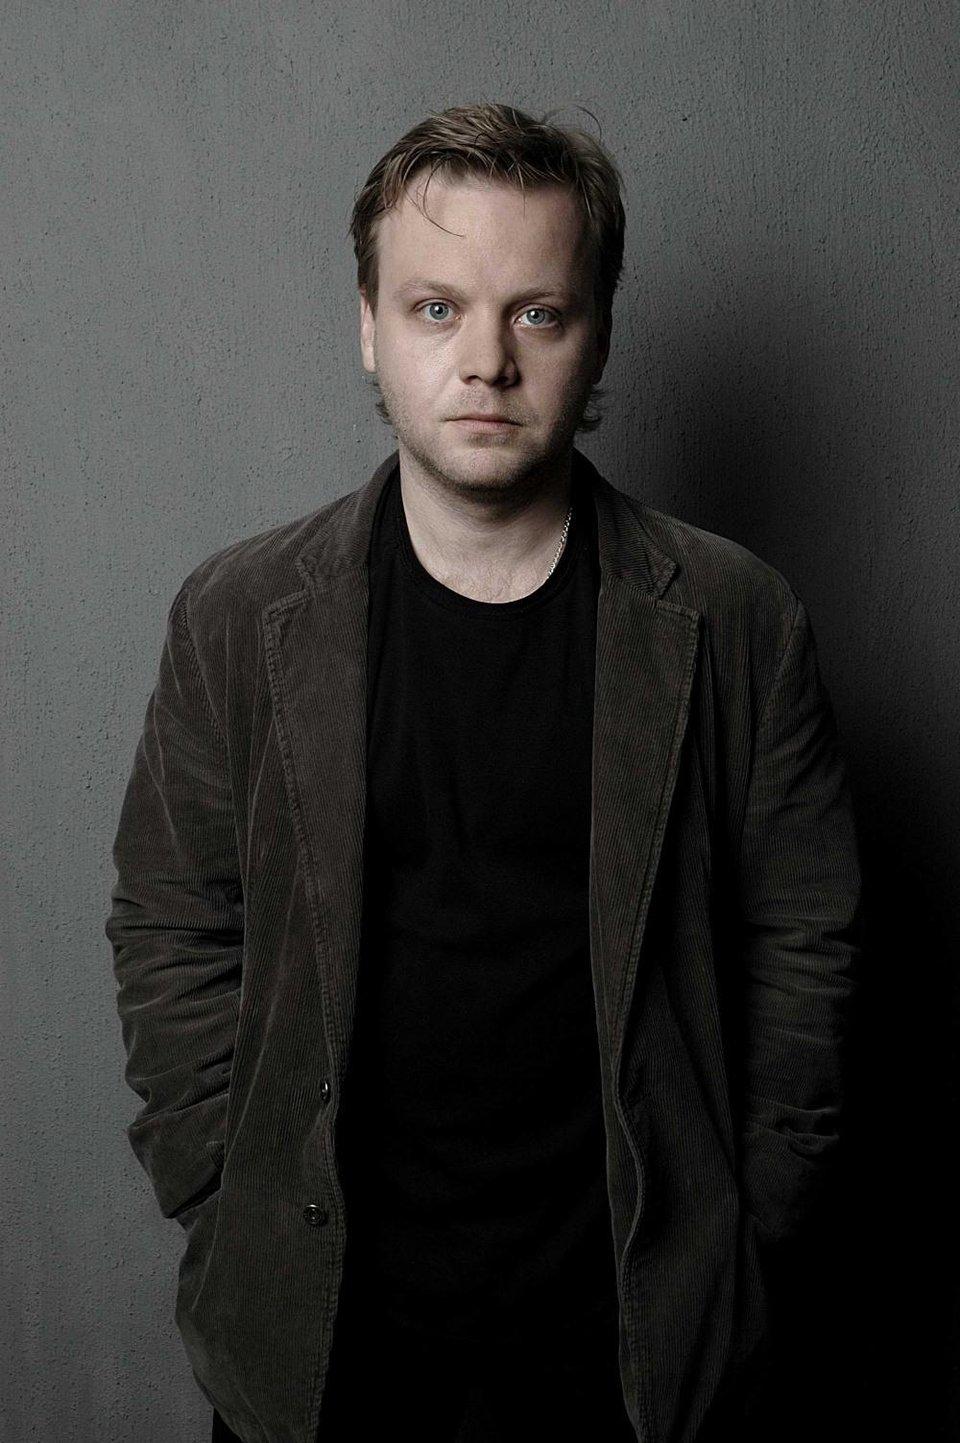 фото Андрей Савостьянов